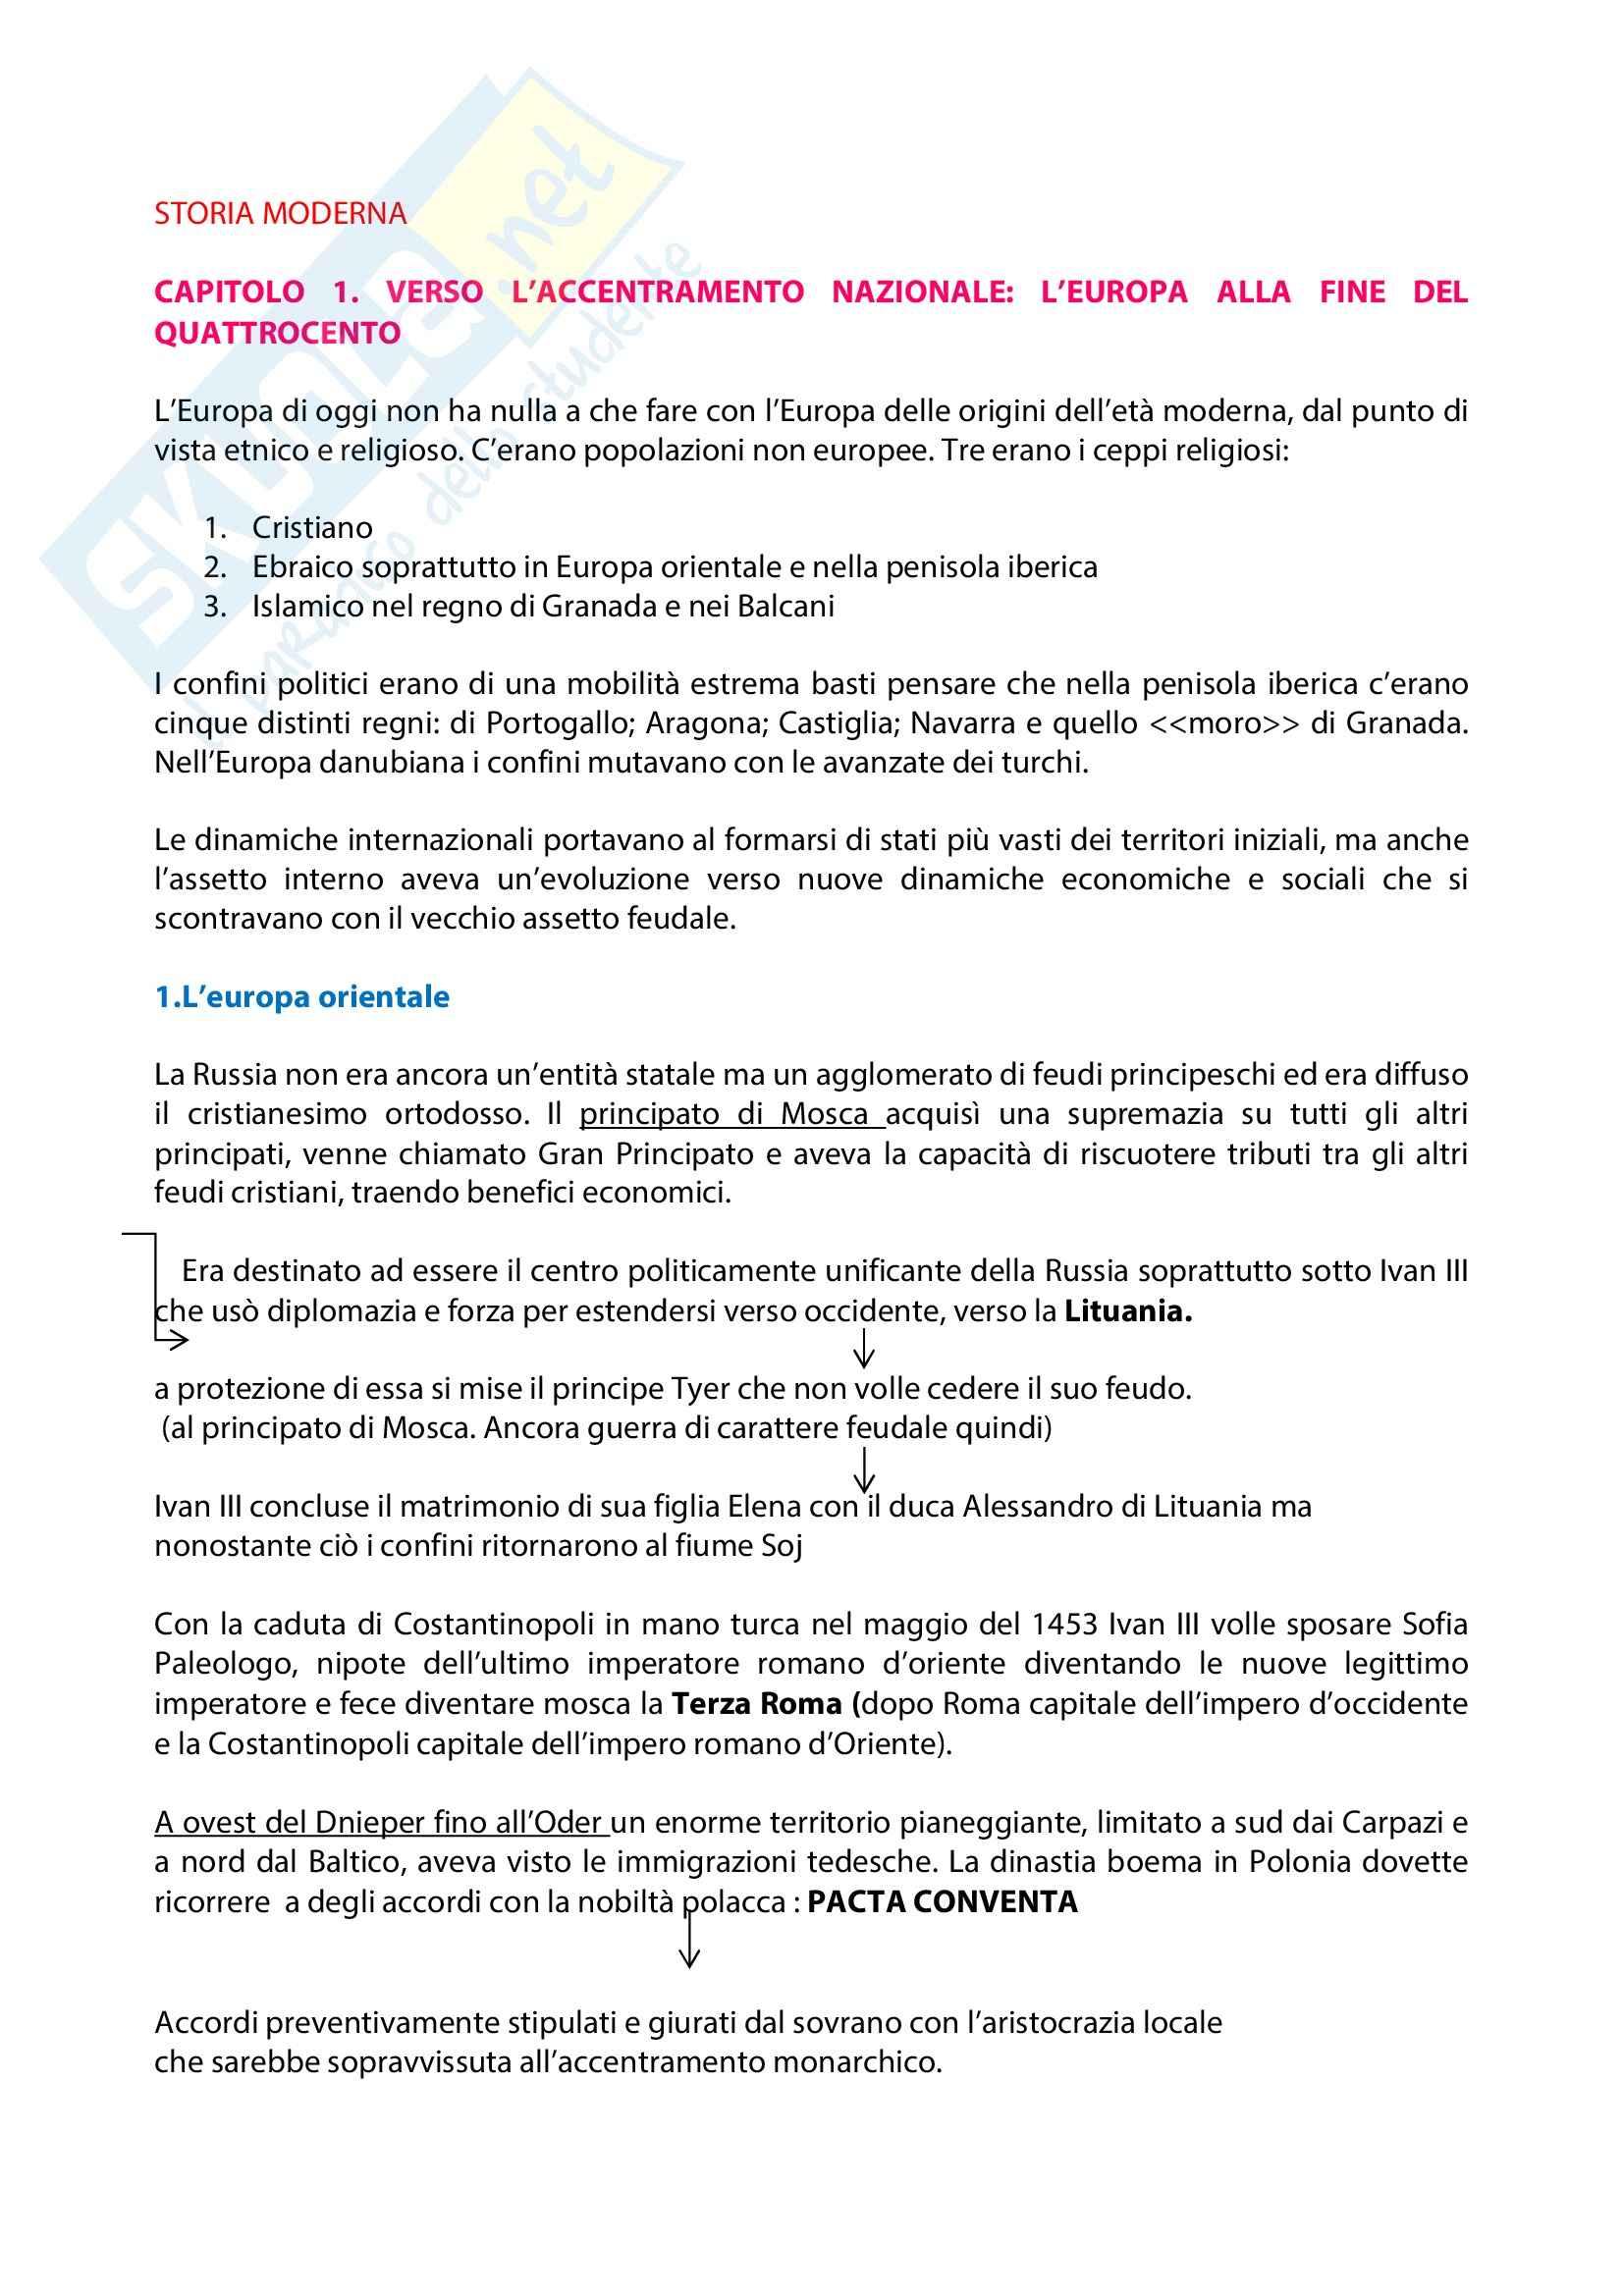 Storia moderna -  Aubert, Cacucci